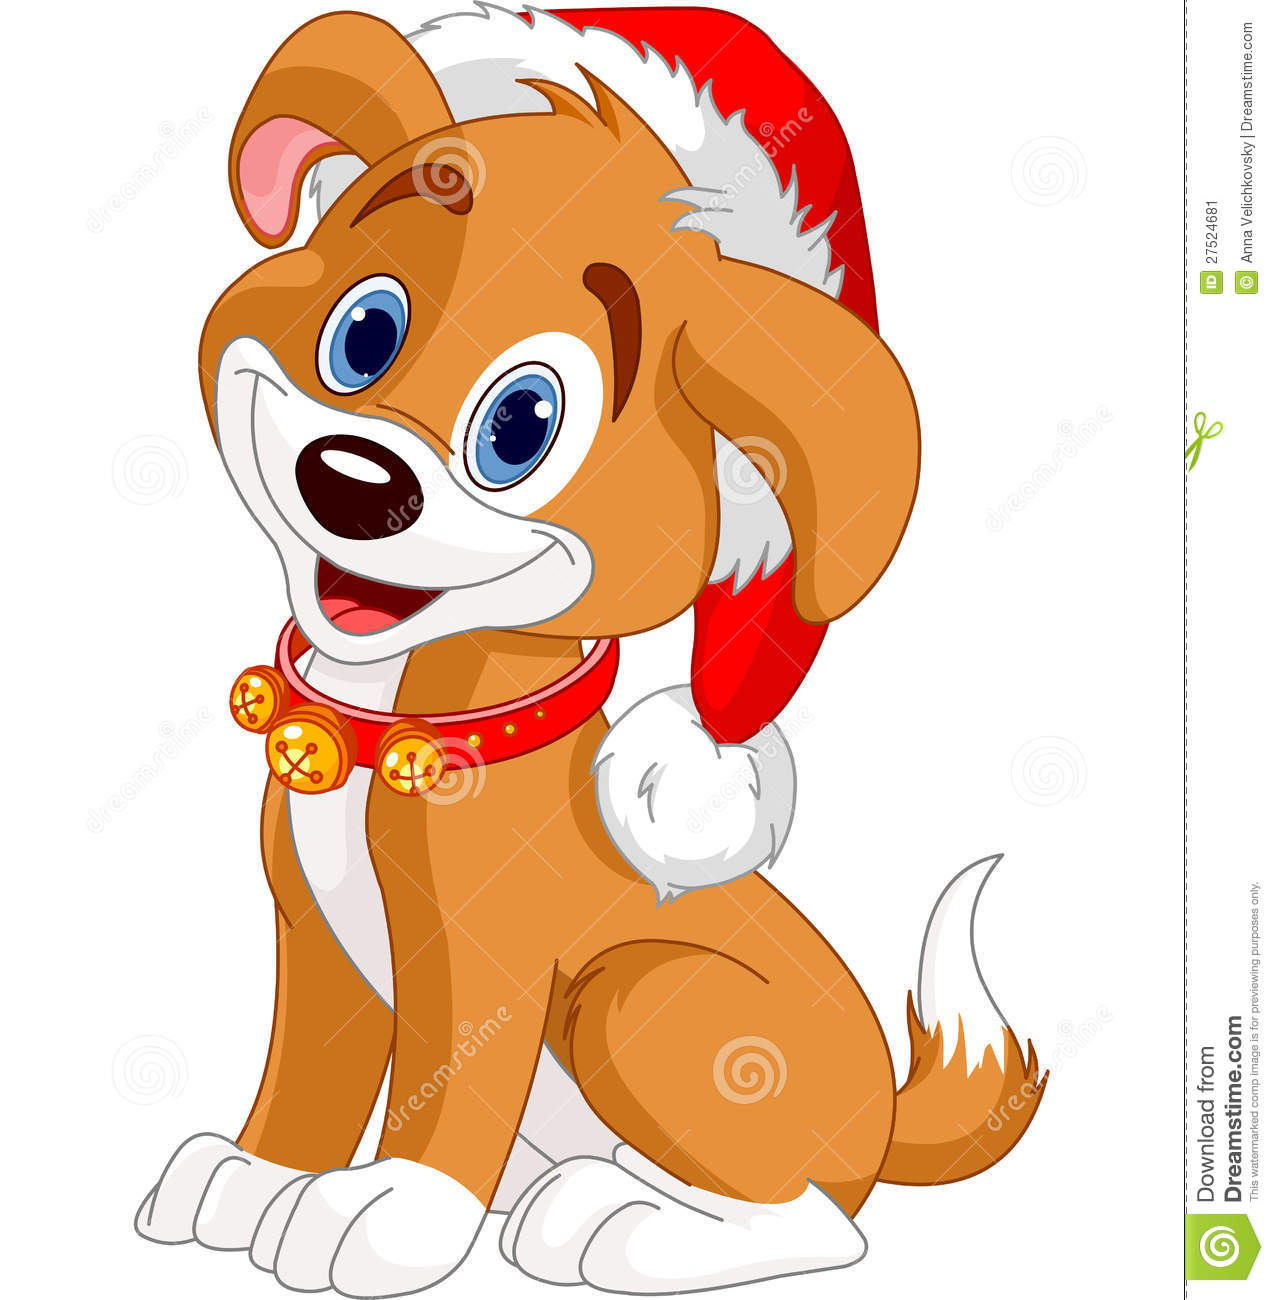 Christmas dog stock vector. Illustration of character.